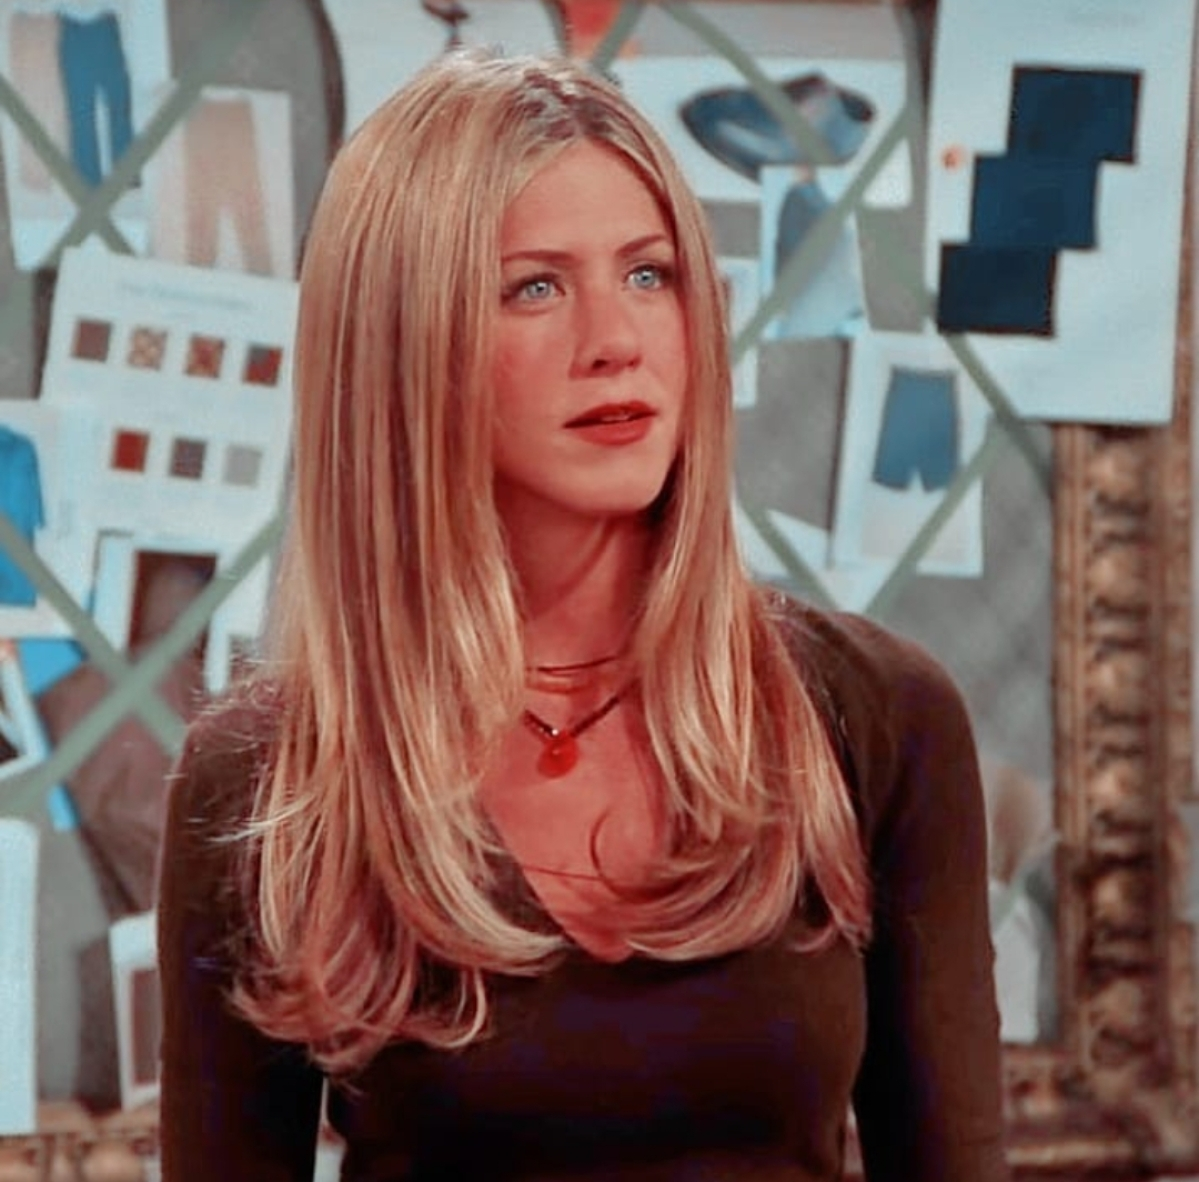 Rachel  played by Jennifer Aniston